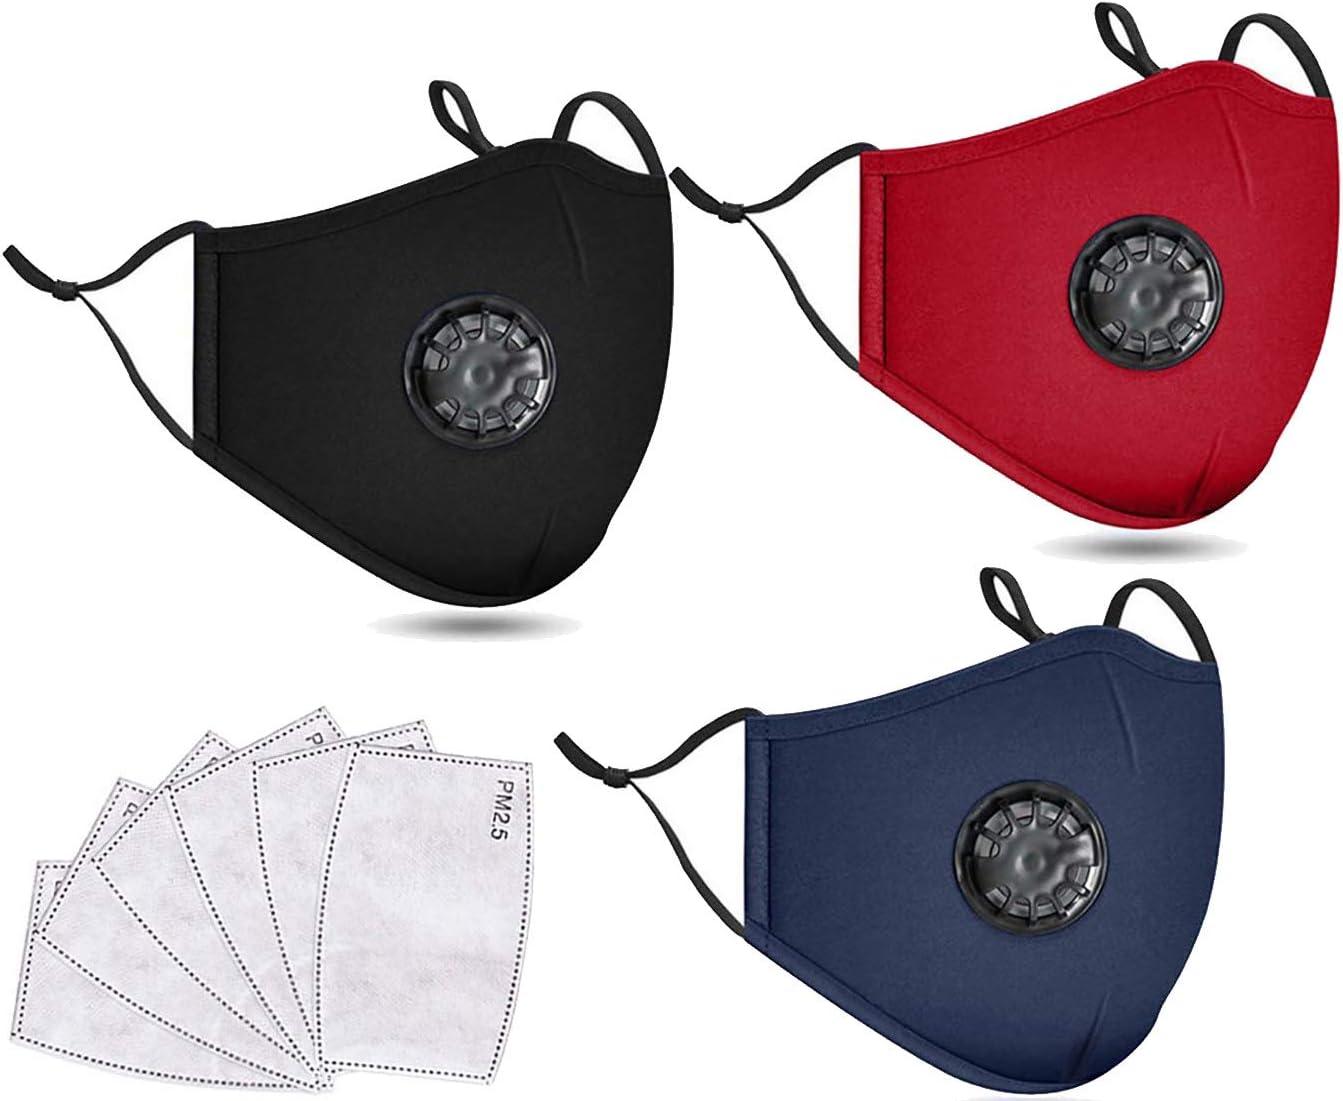 EQOBA 3 Pack Unisex Washable Reusable Cotton Face mask